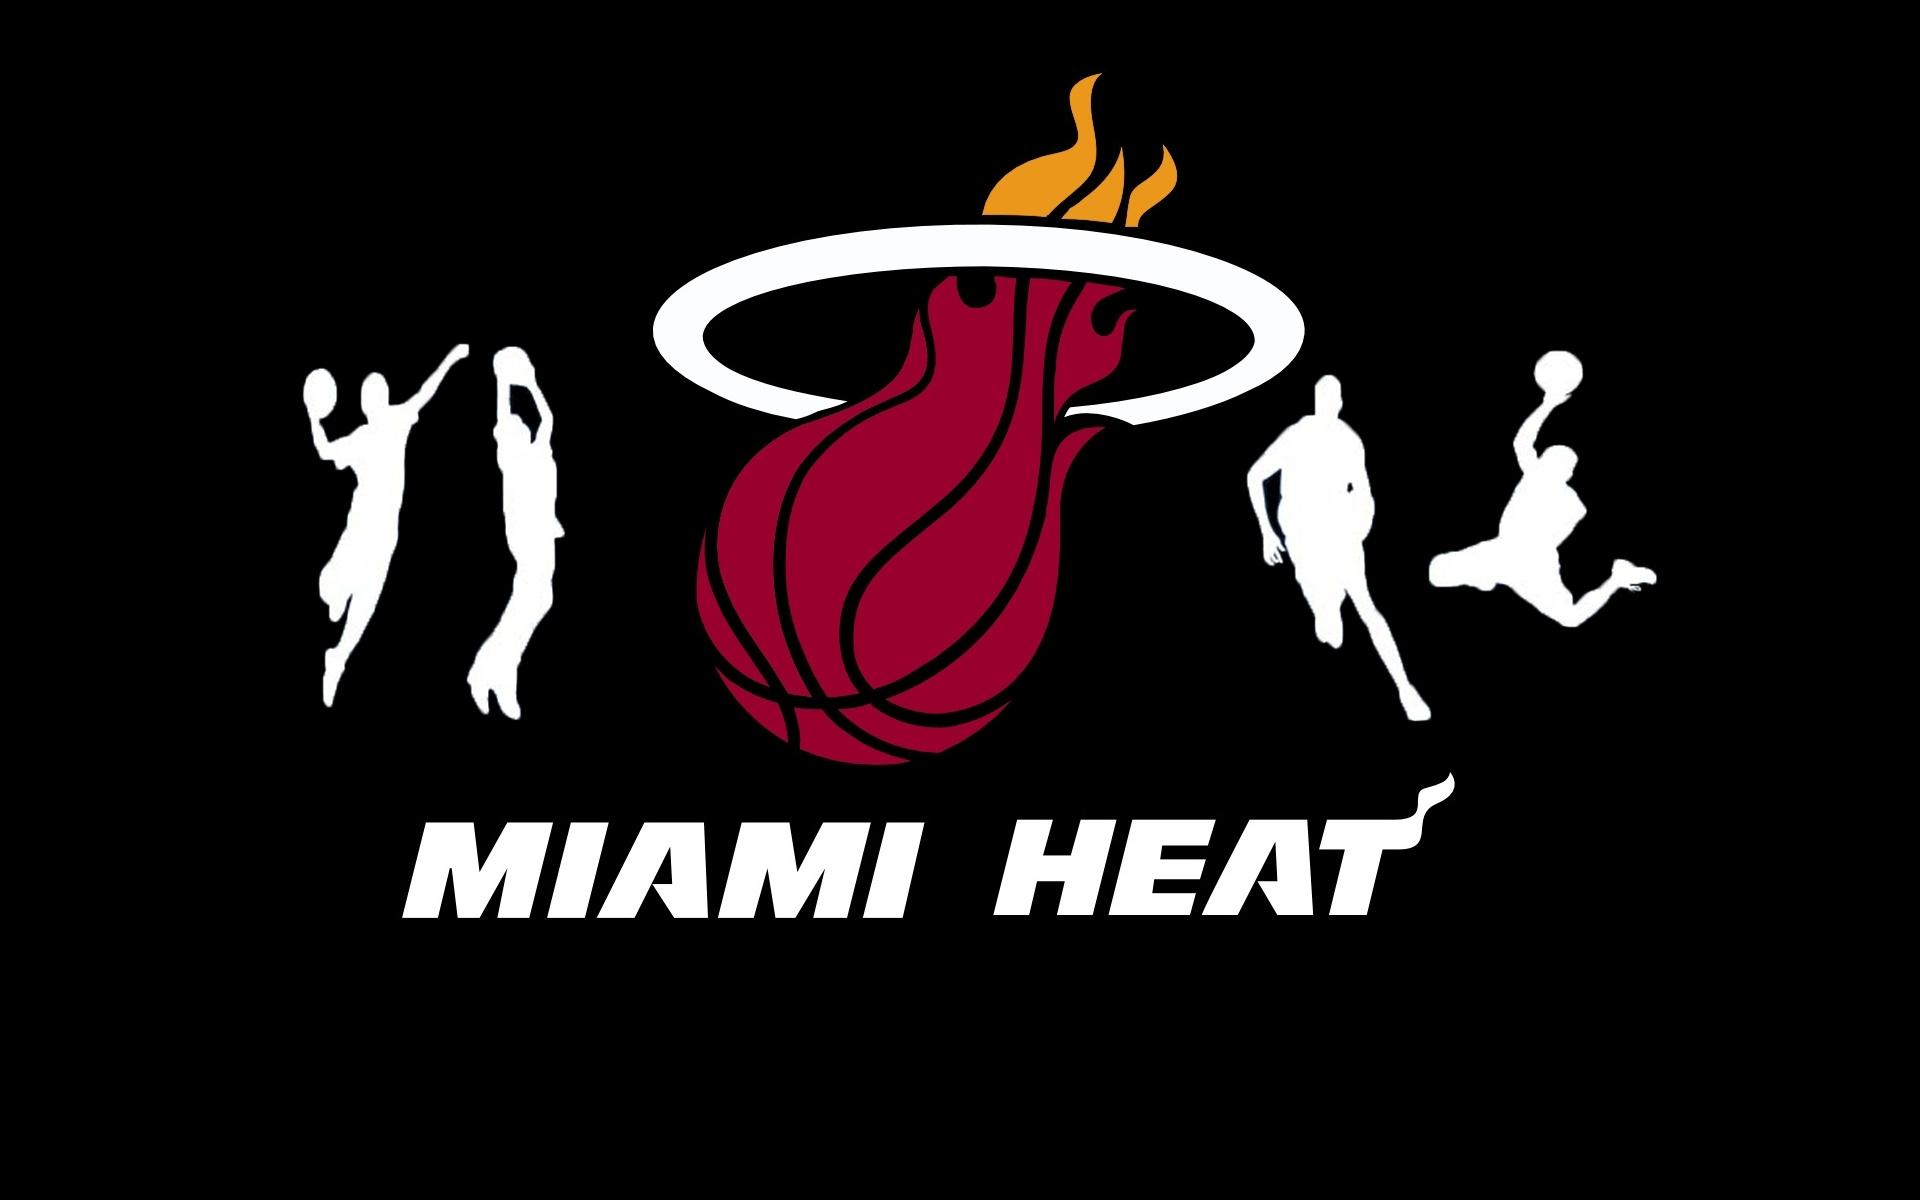 daisyamongdaisies: miami heat logo art wallpaper images